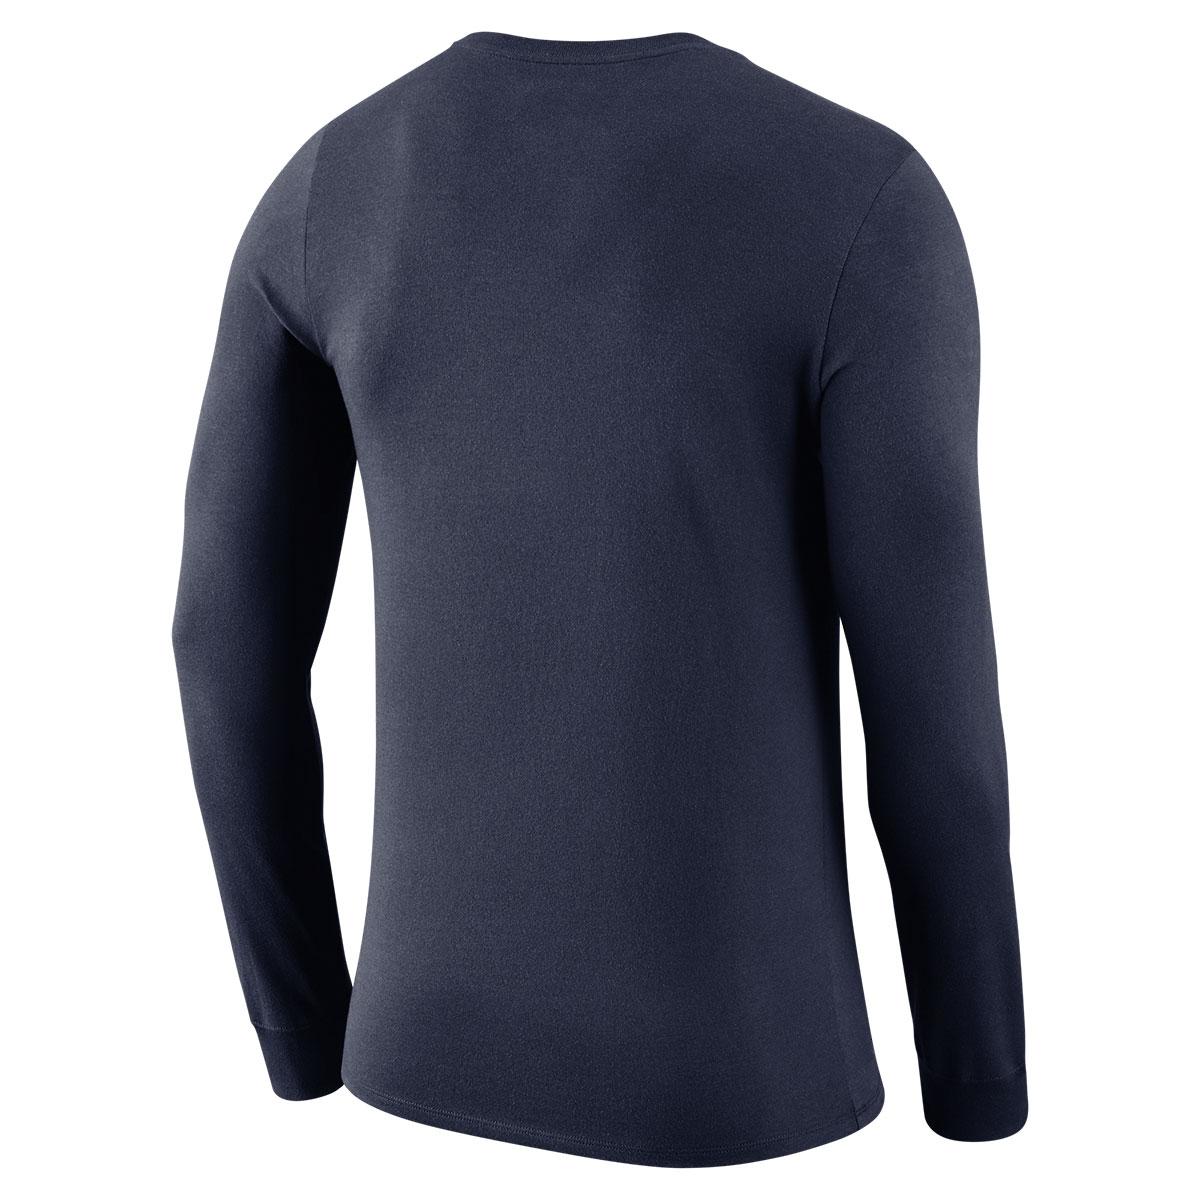 University of Virginia Nike Dri-FIT LS Crew T-Shirt